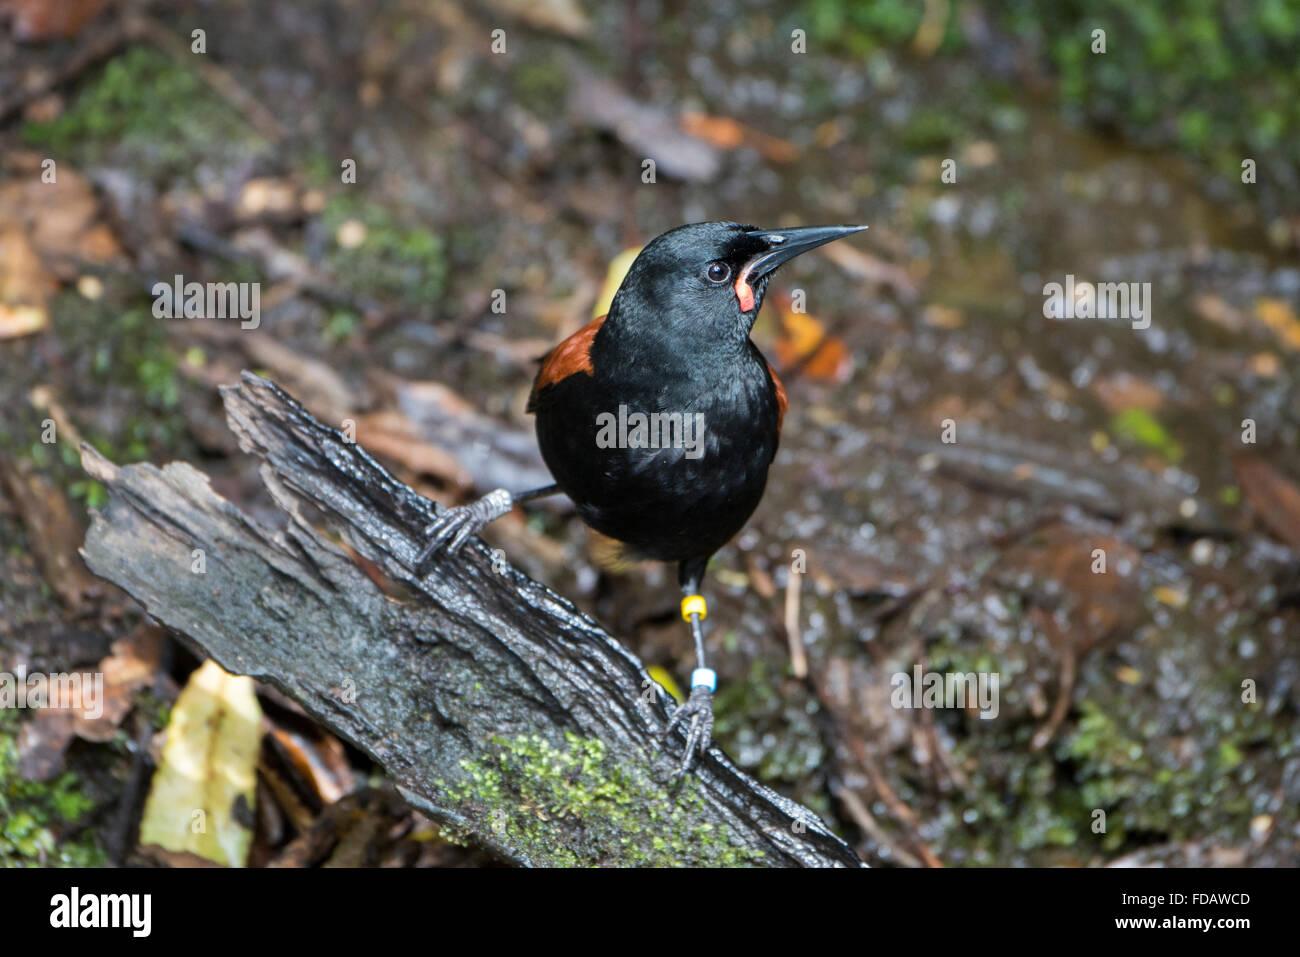 New Zealand, Marlborough Sounds, Queen Charlotte Sound, Motuara Island aka Motu Ara. Predator-free island bird reserve. Stock Photo